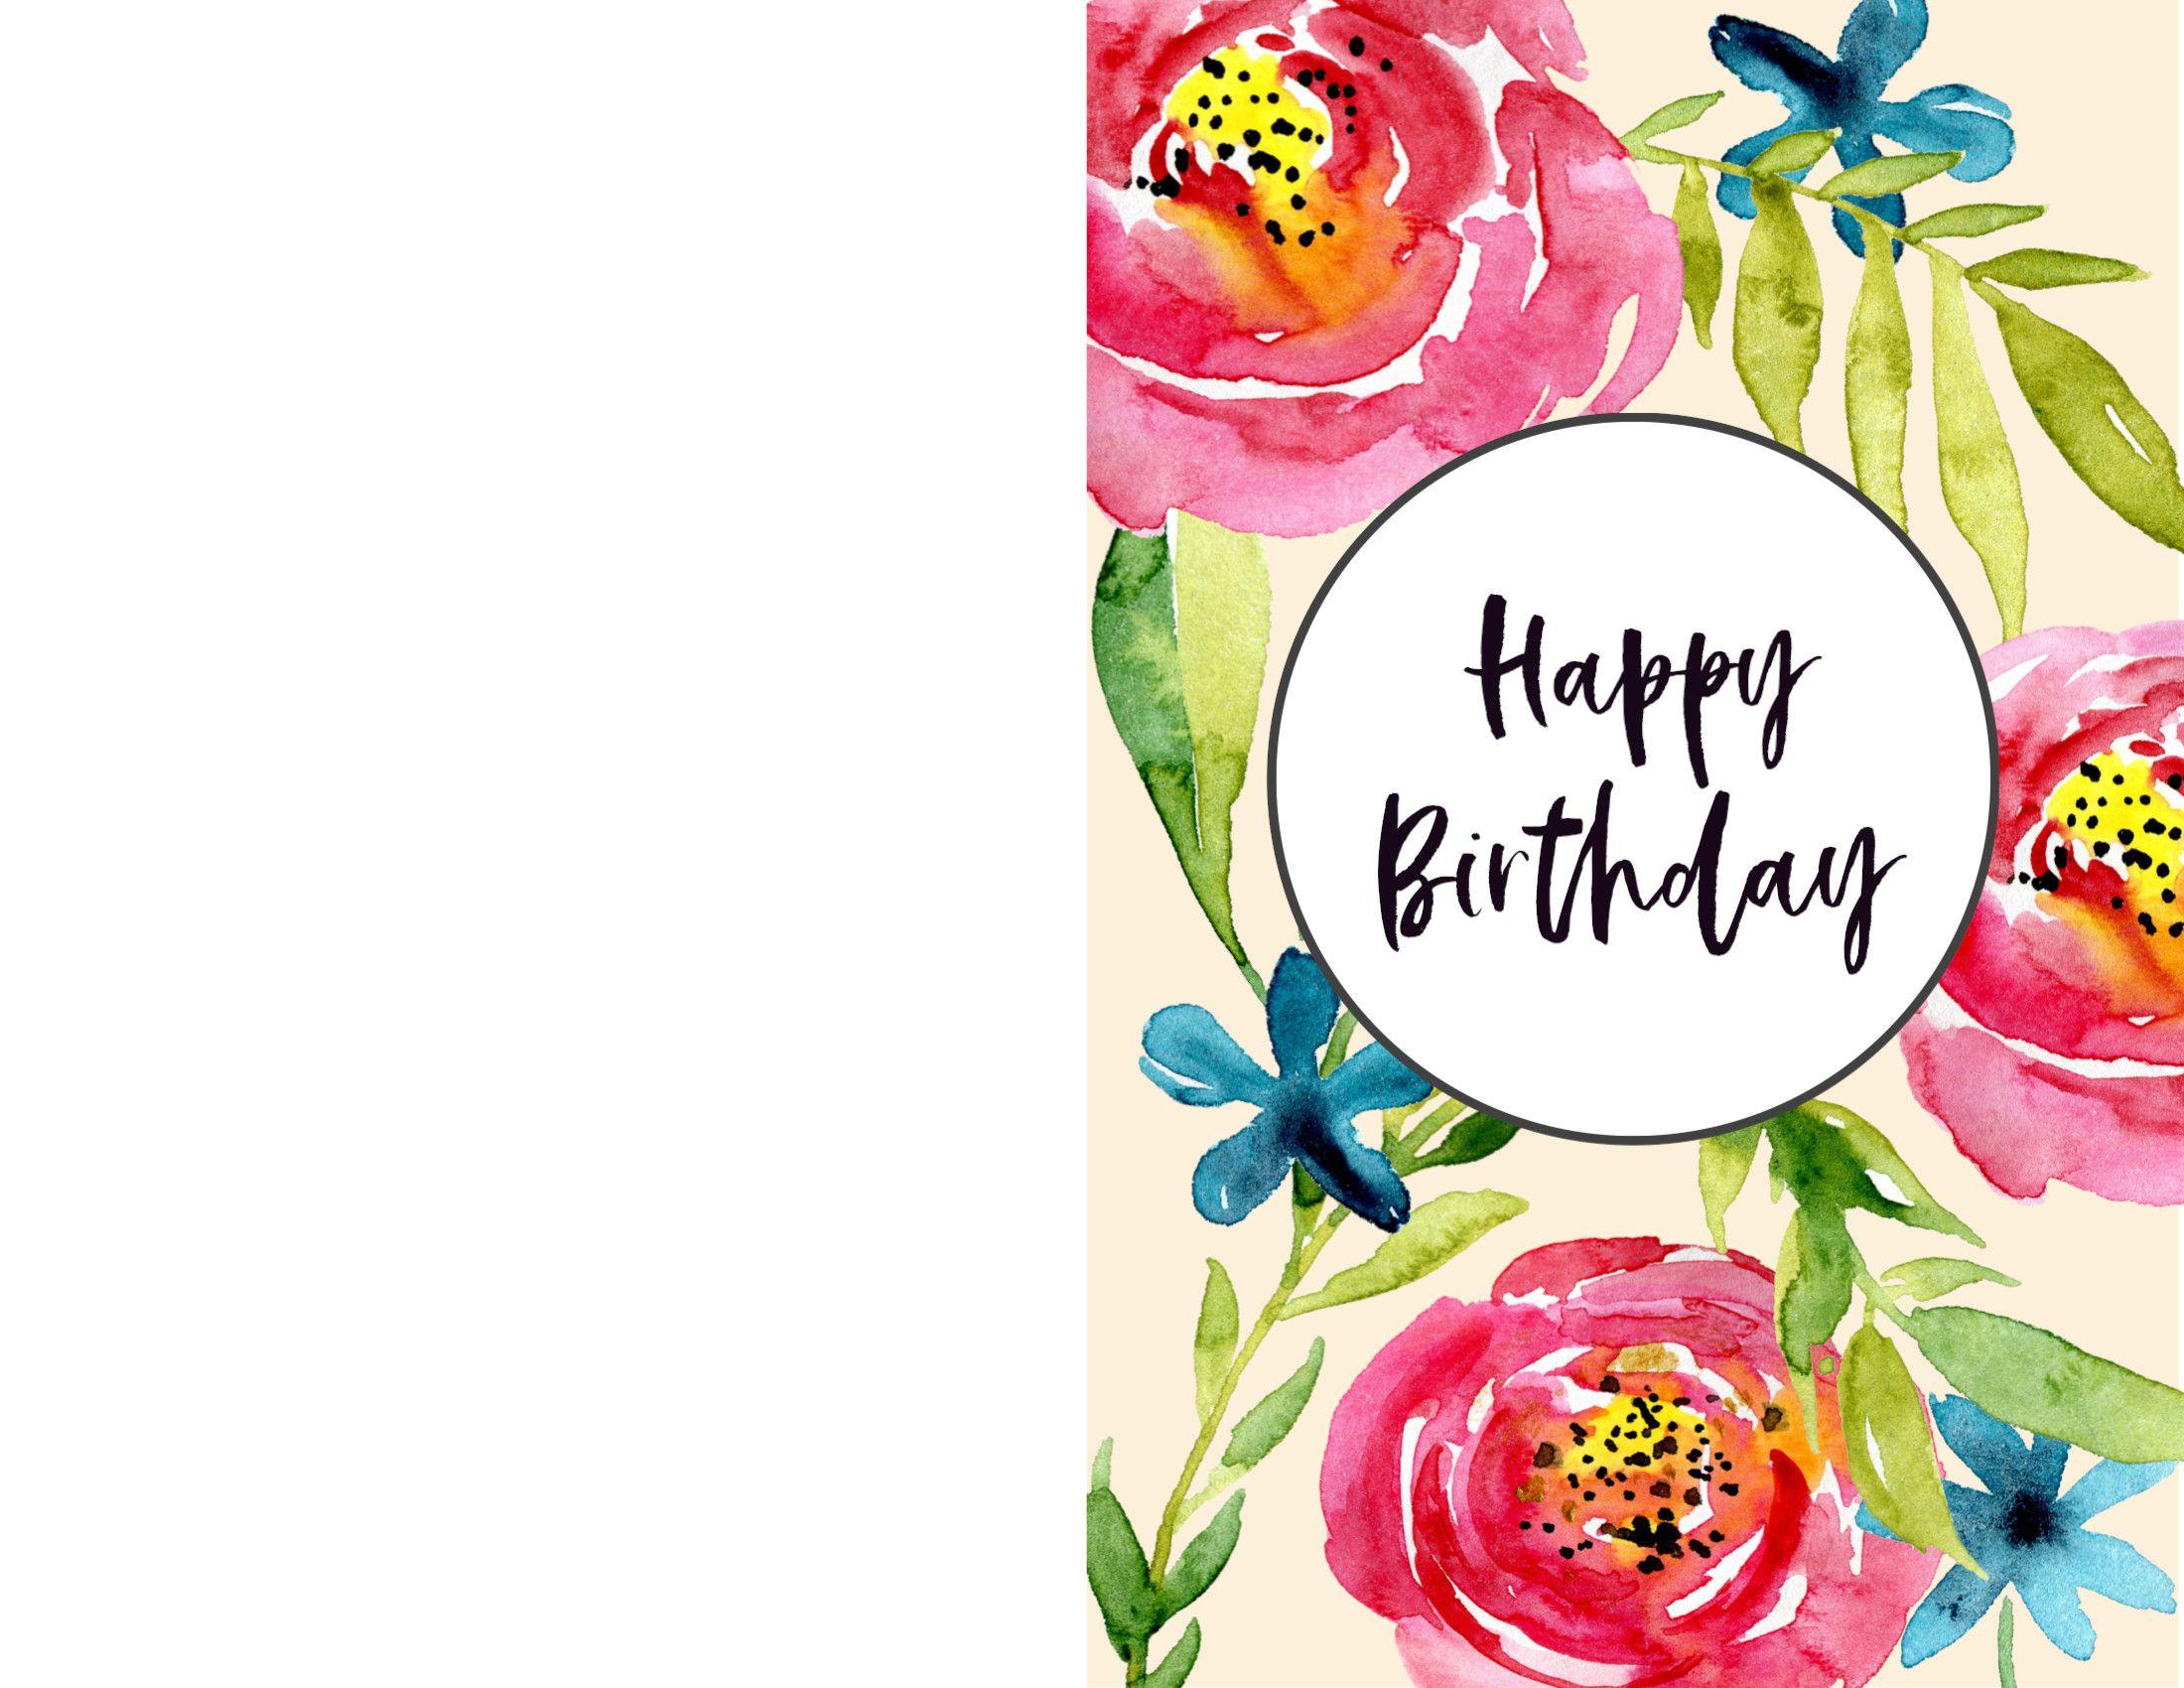 008 Birthday Card Template Blank Breathtaking Ideas 1st With Regard To Birthday Card P Free Birthday Card Download Birthday Cards Free Printable Birthday Cards